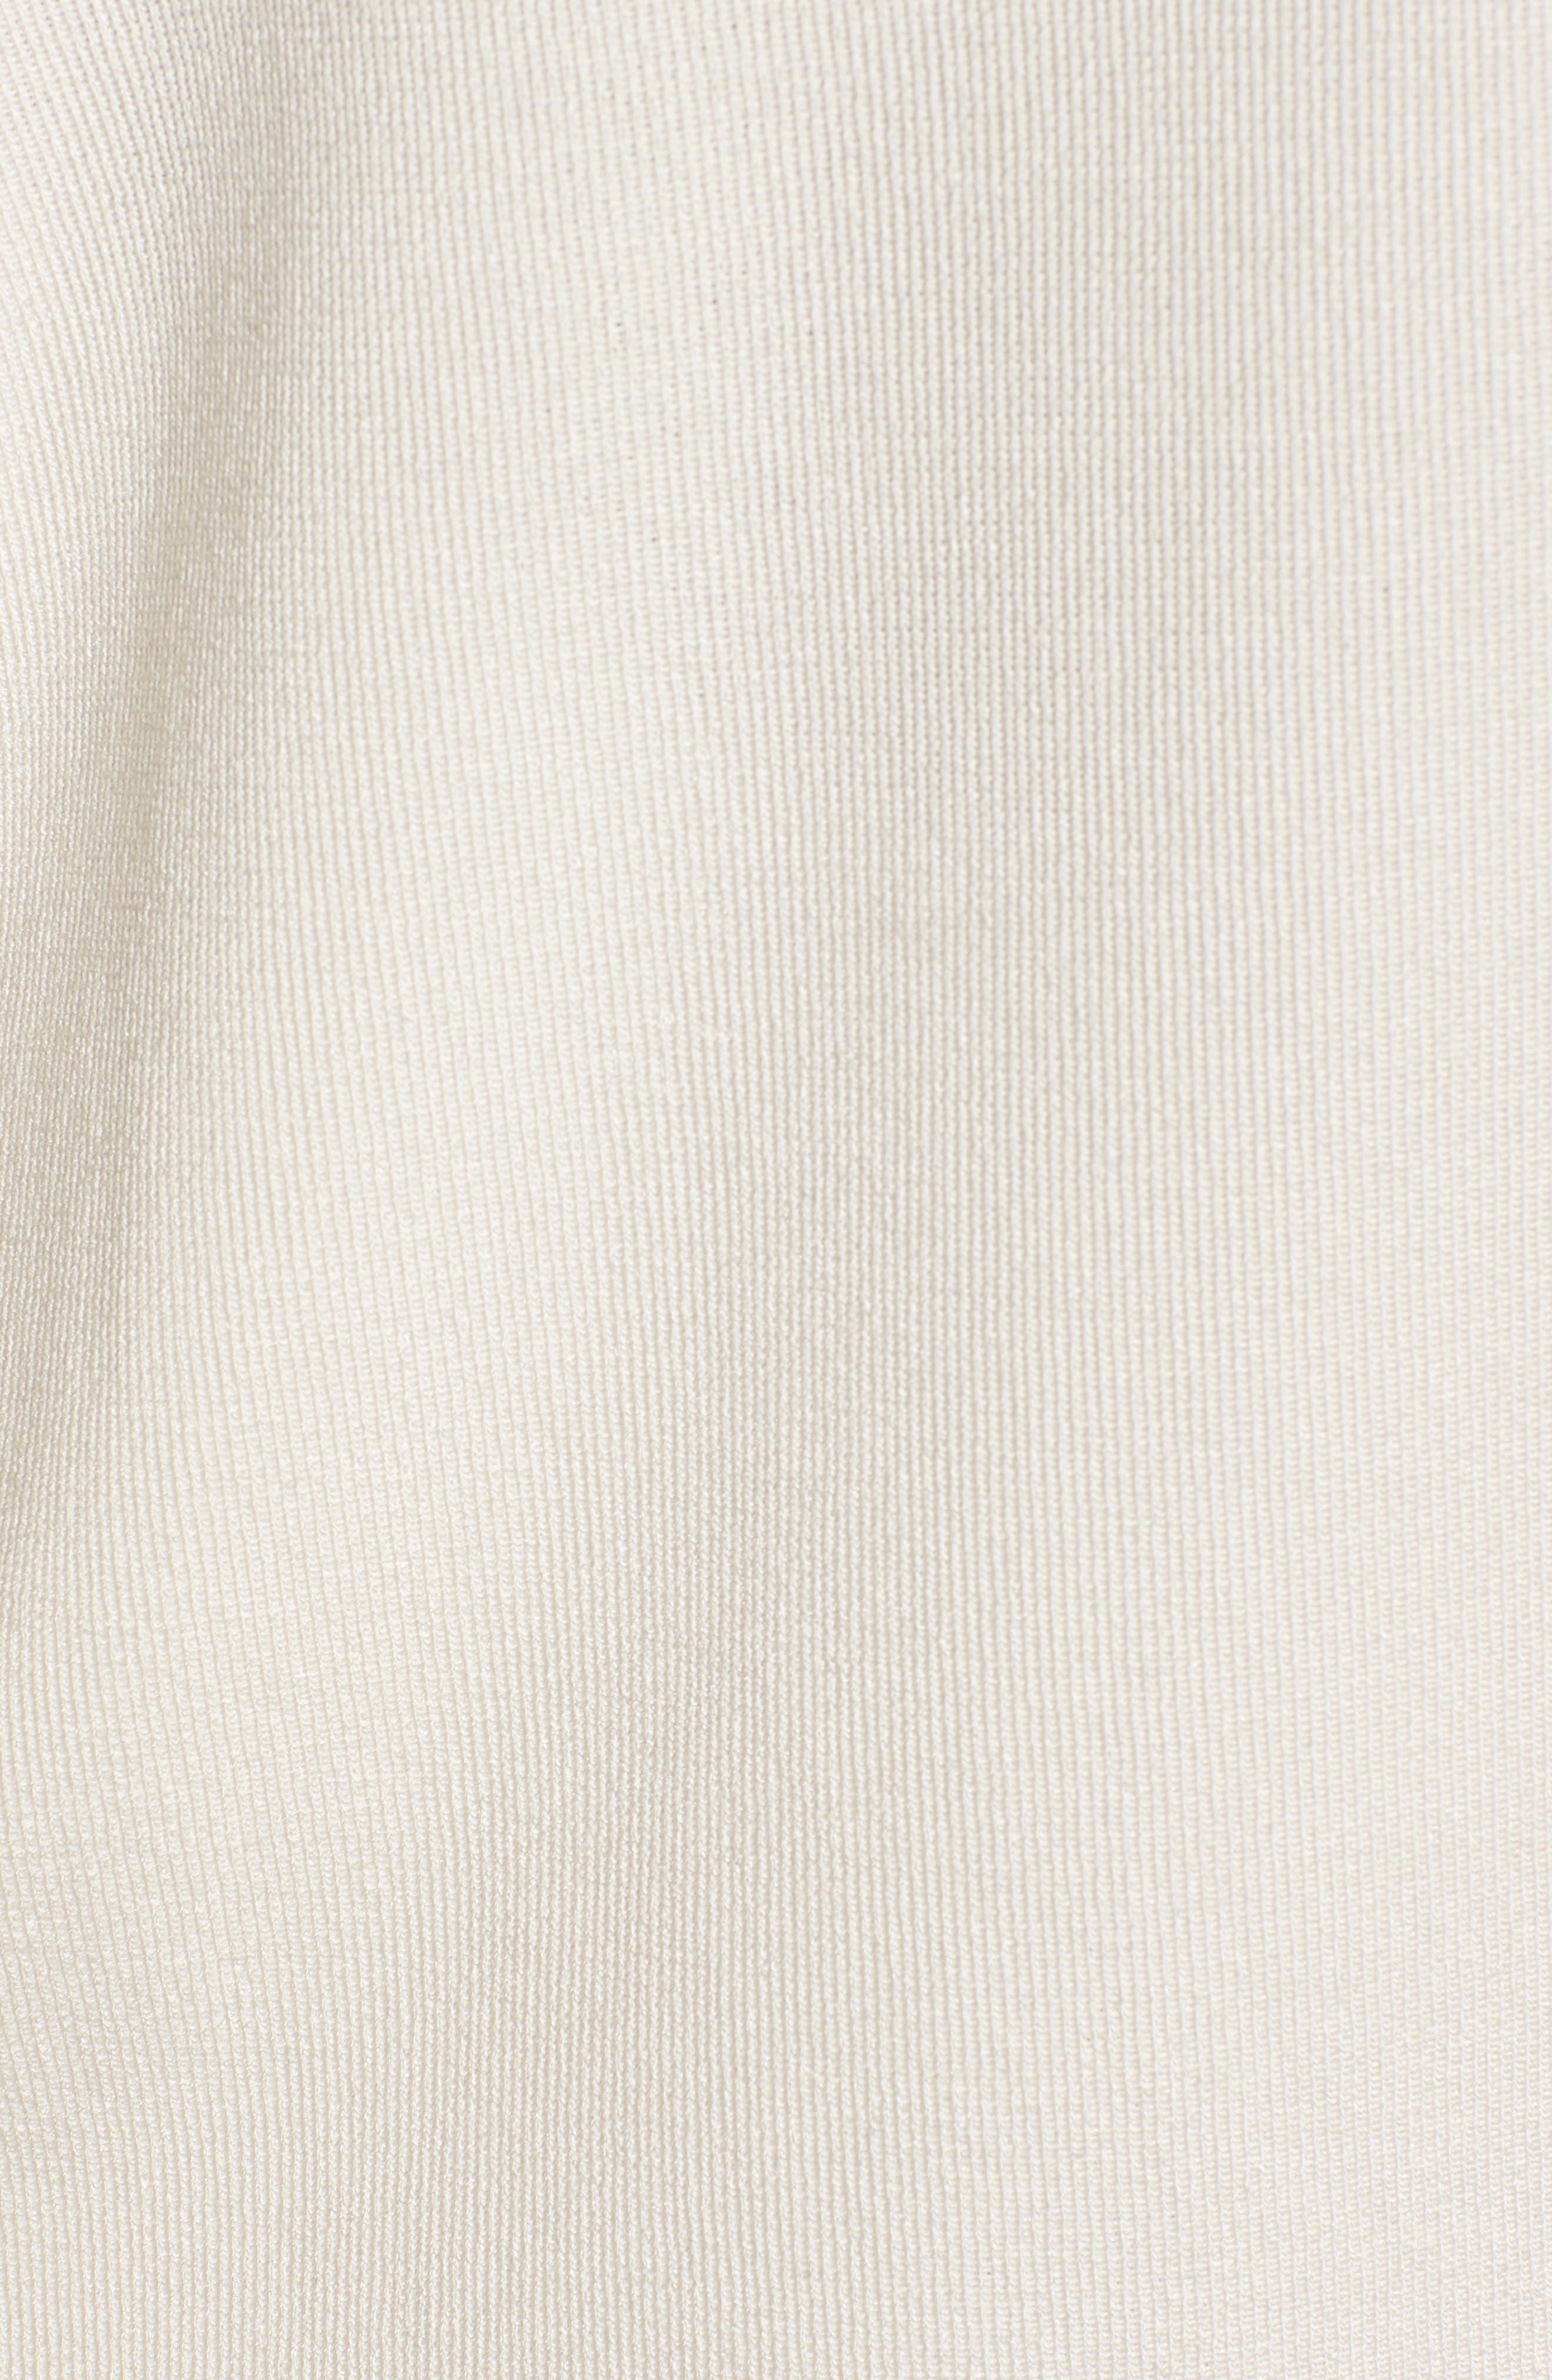 Patch Pocket Cardigan,                             Alternate thumbnail 10, color,